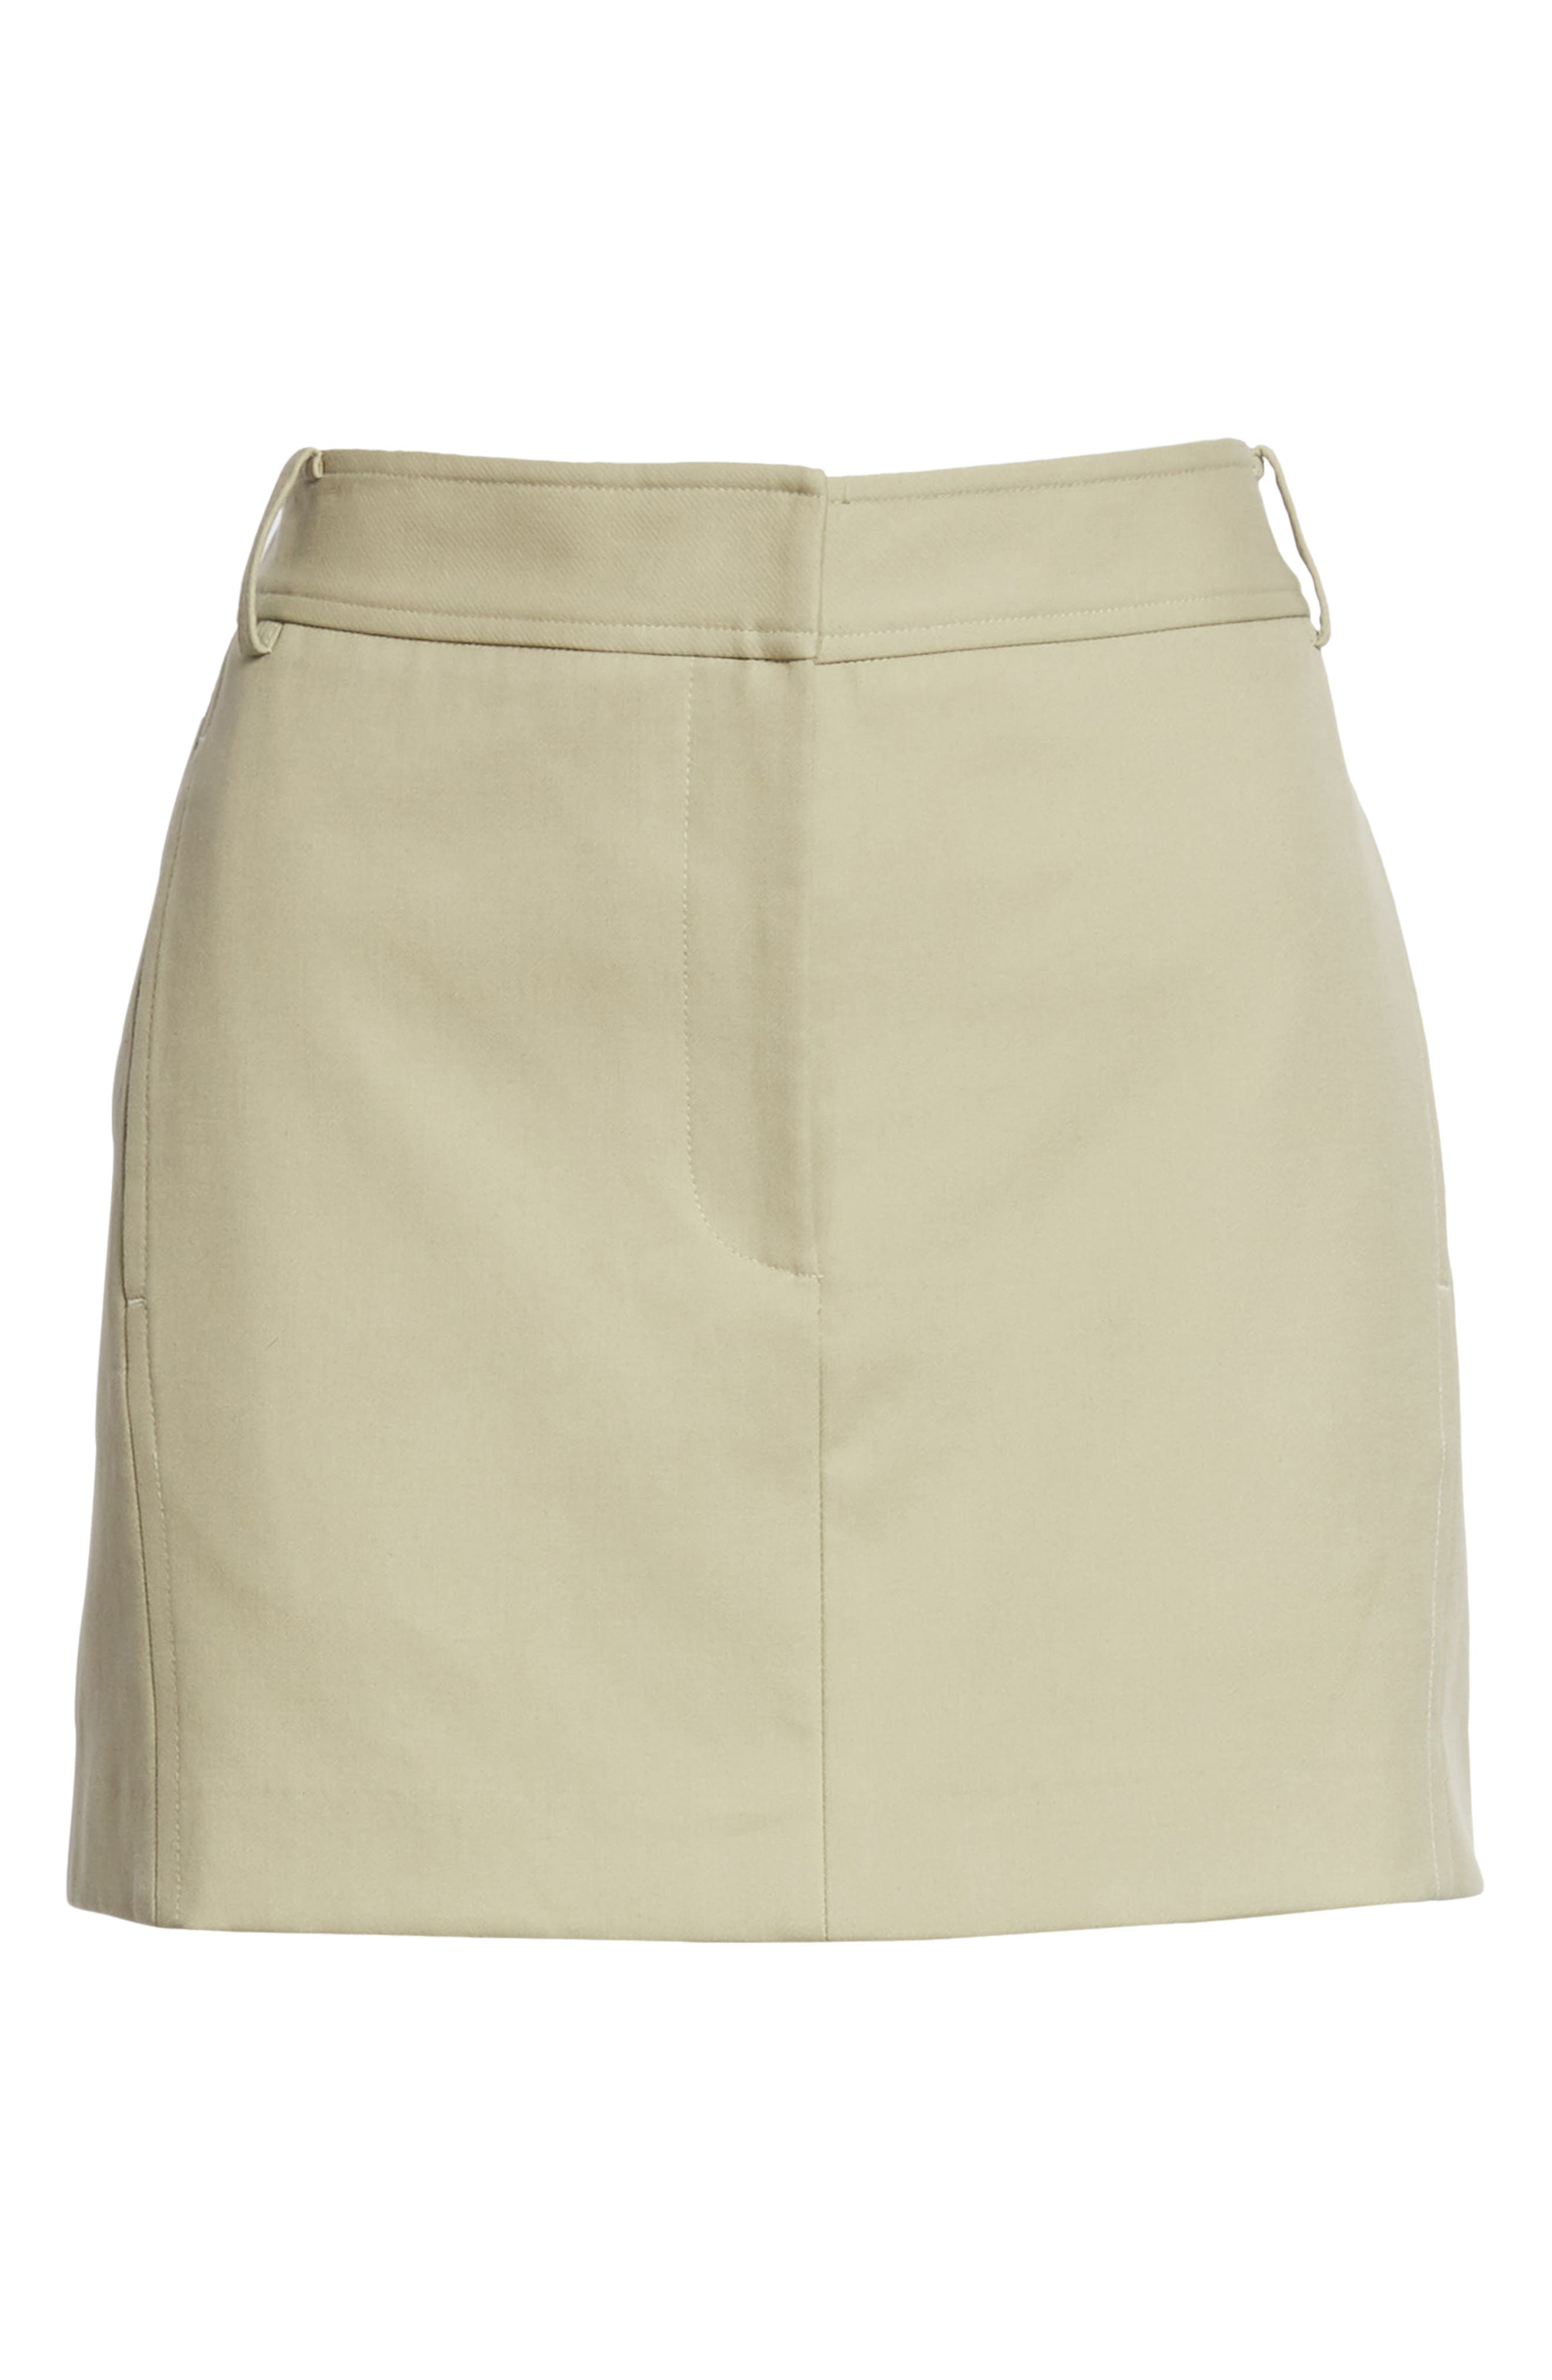 TIBI,                             Margaux Miniskirt,                             Alternate thumbnail 6, color,                             310